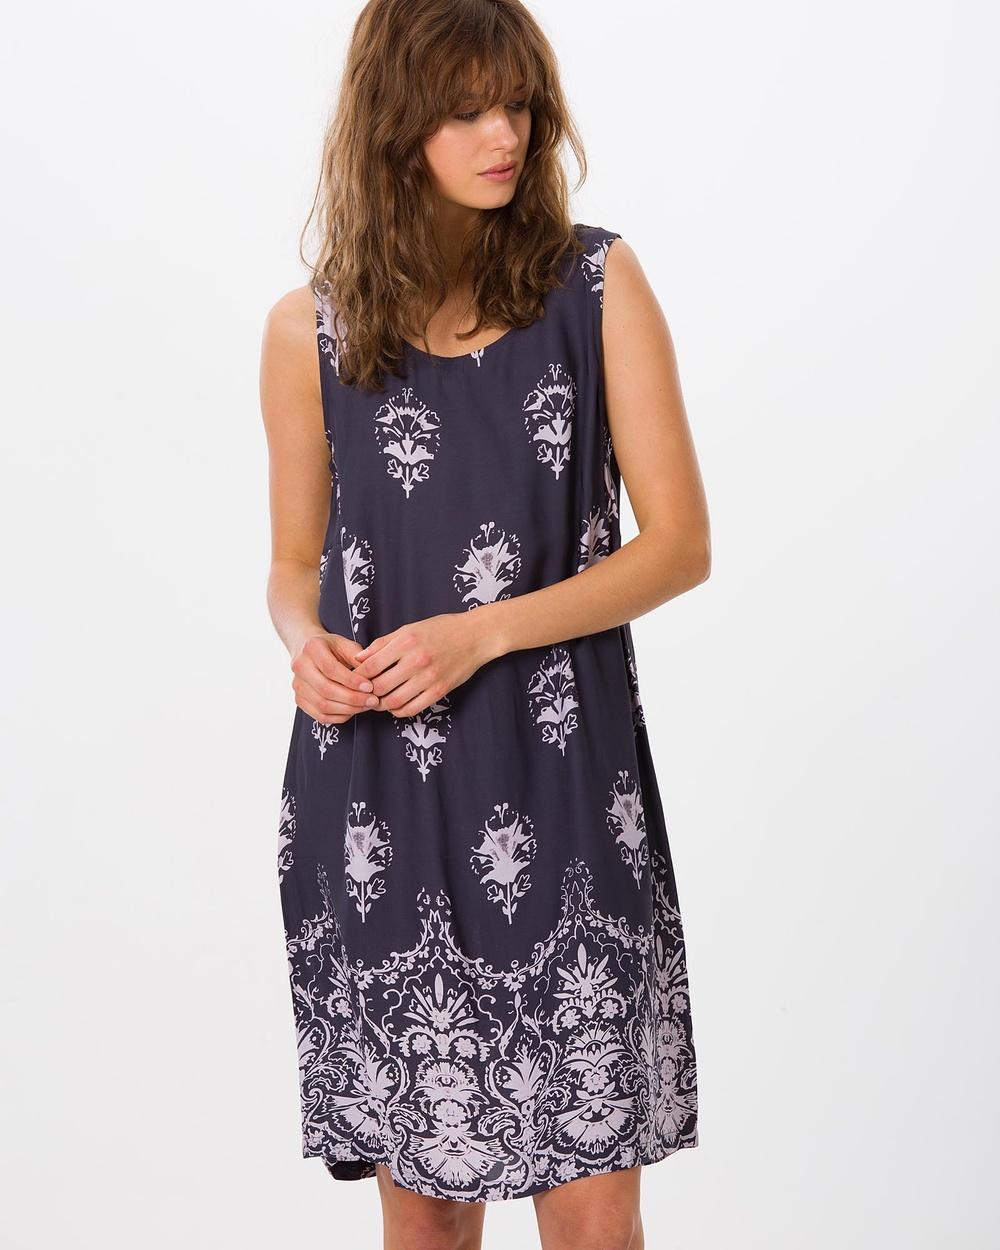 Kaja Clothing Petra Dress Dresses Grey Floral Petra Dress